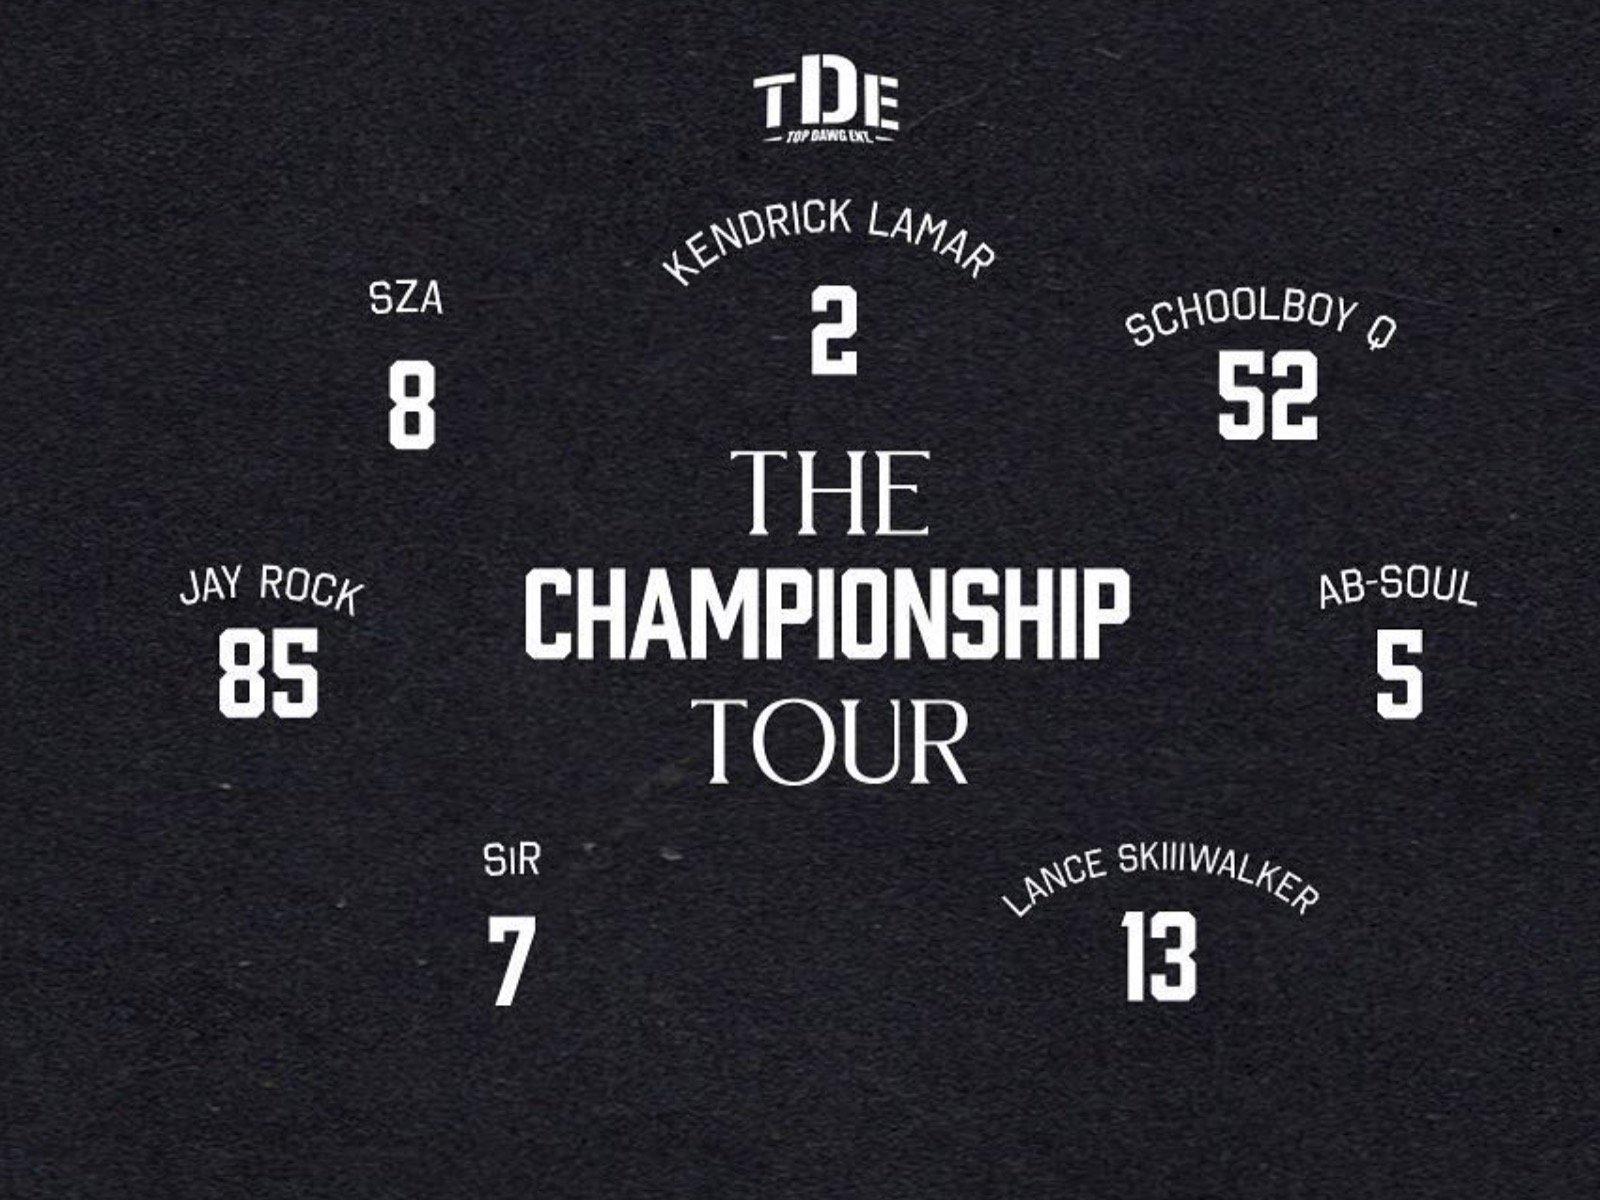 TDE Championship Tour